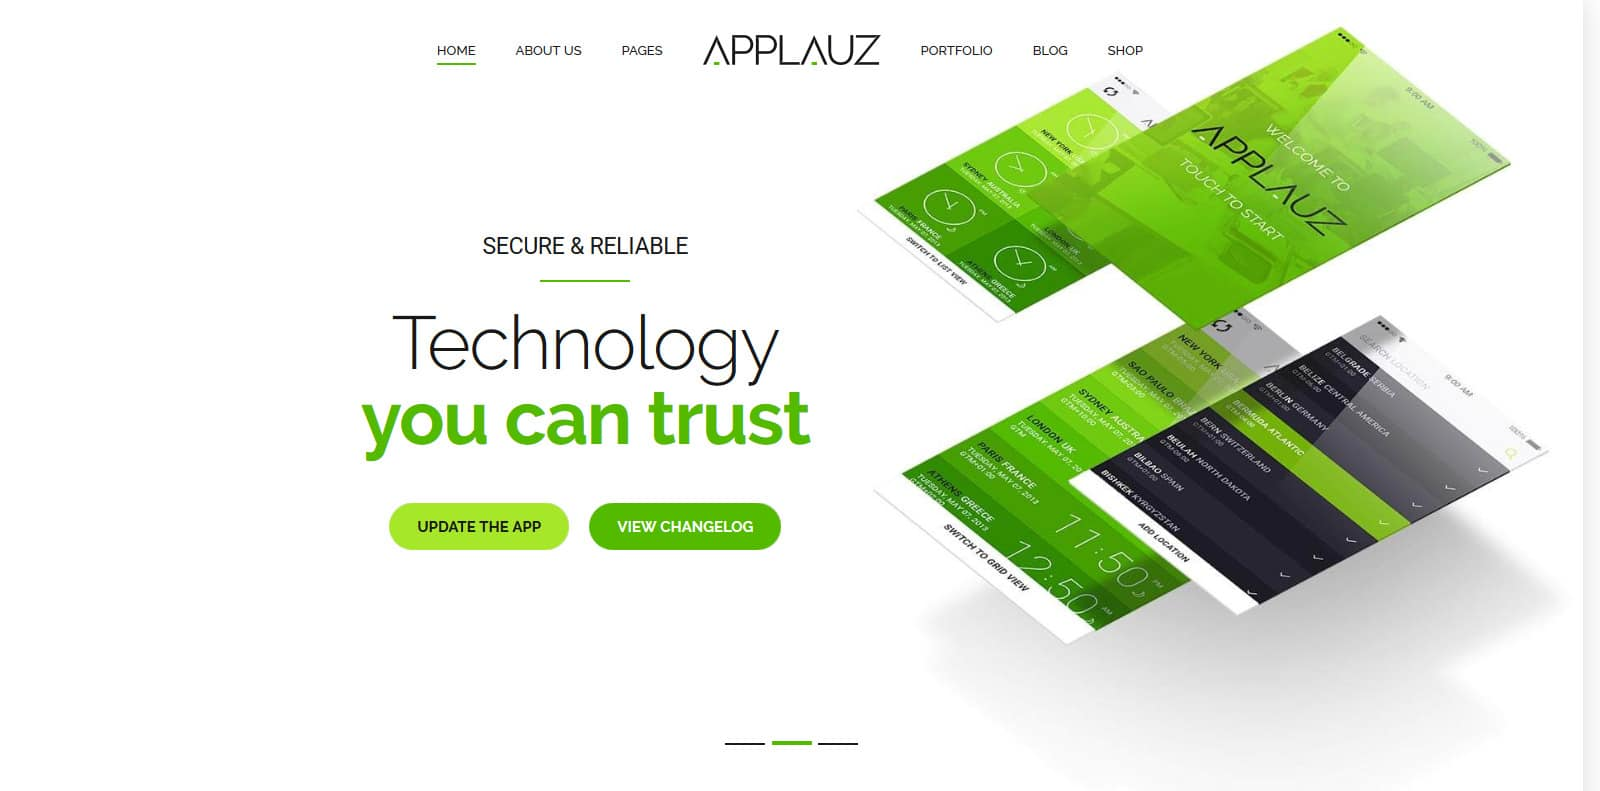 applauz-software-website-template